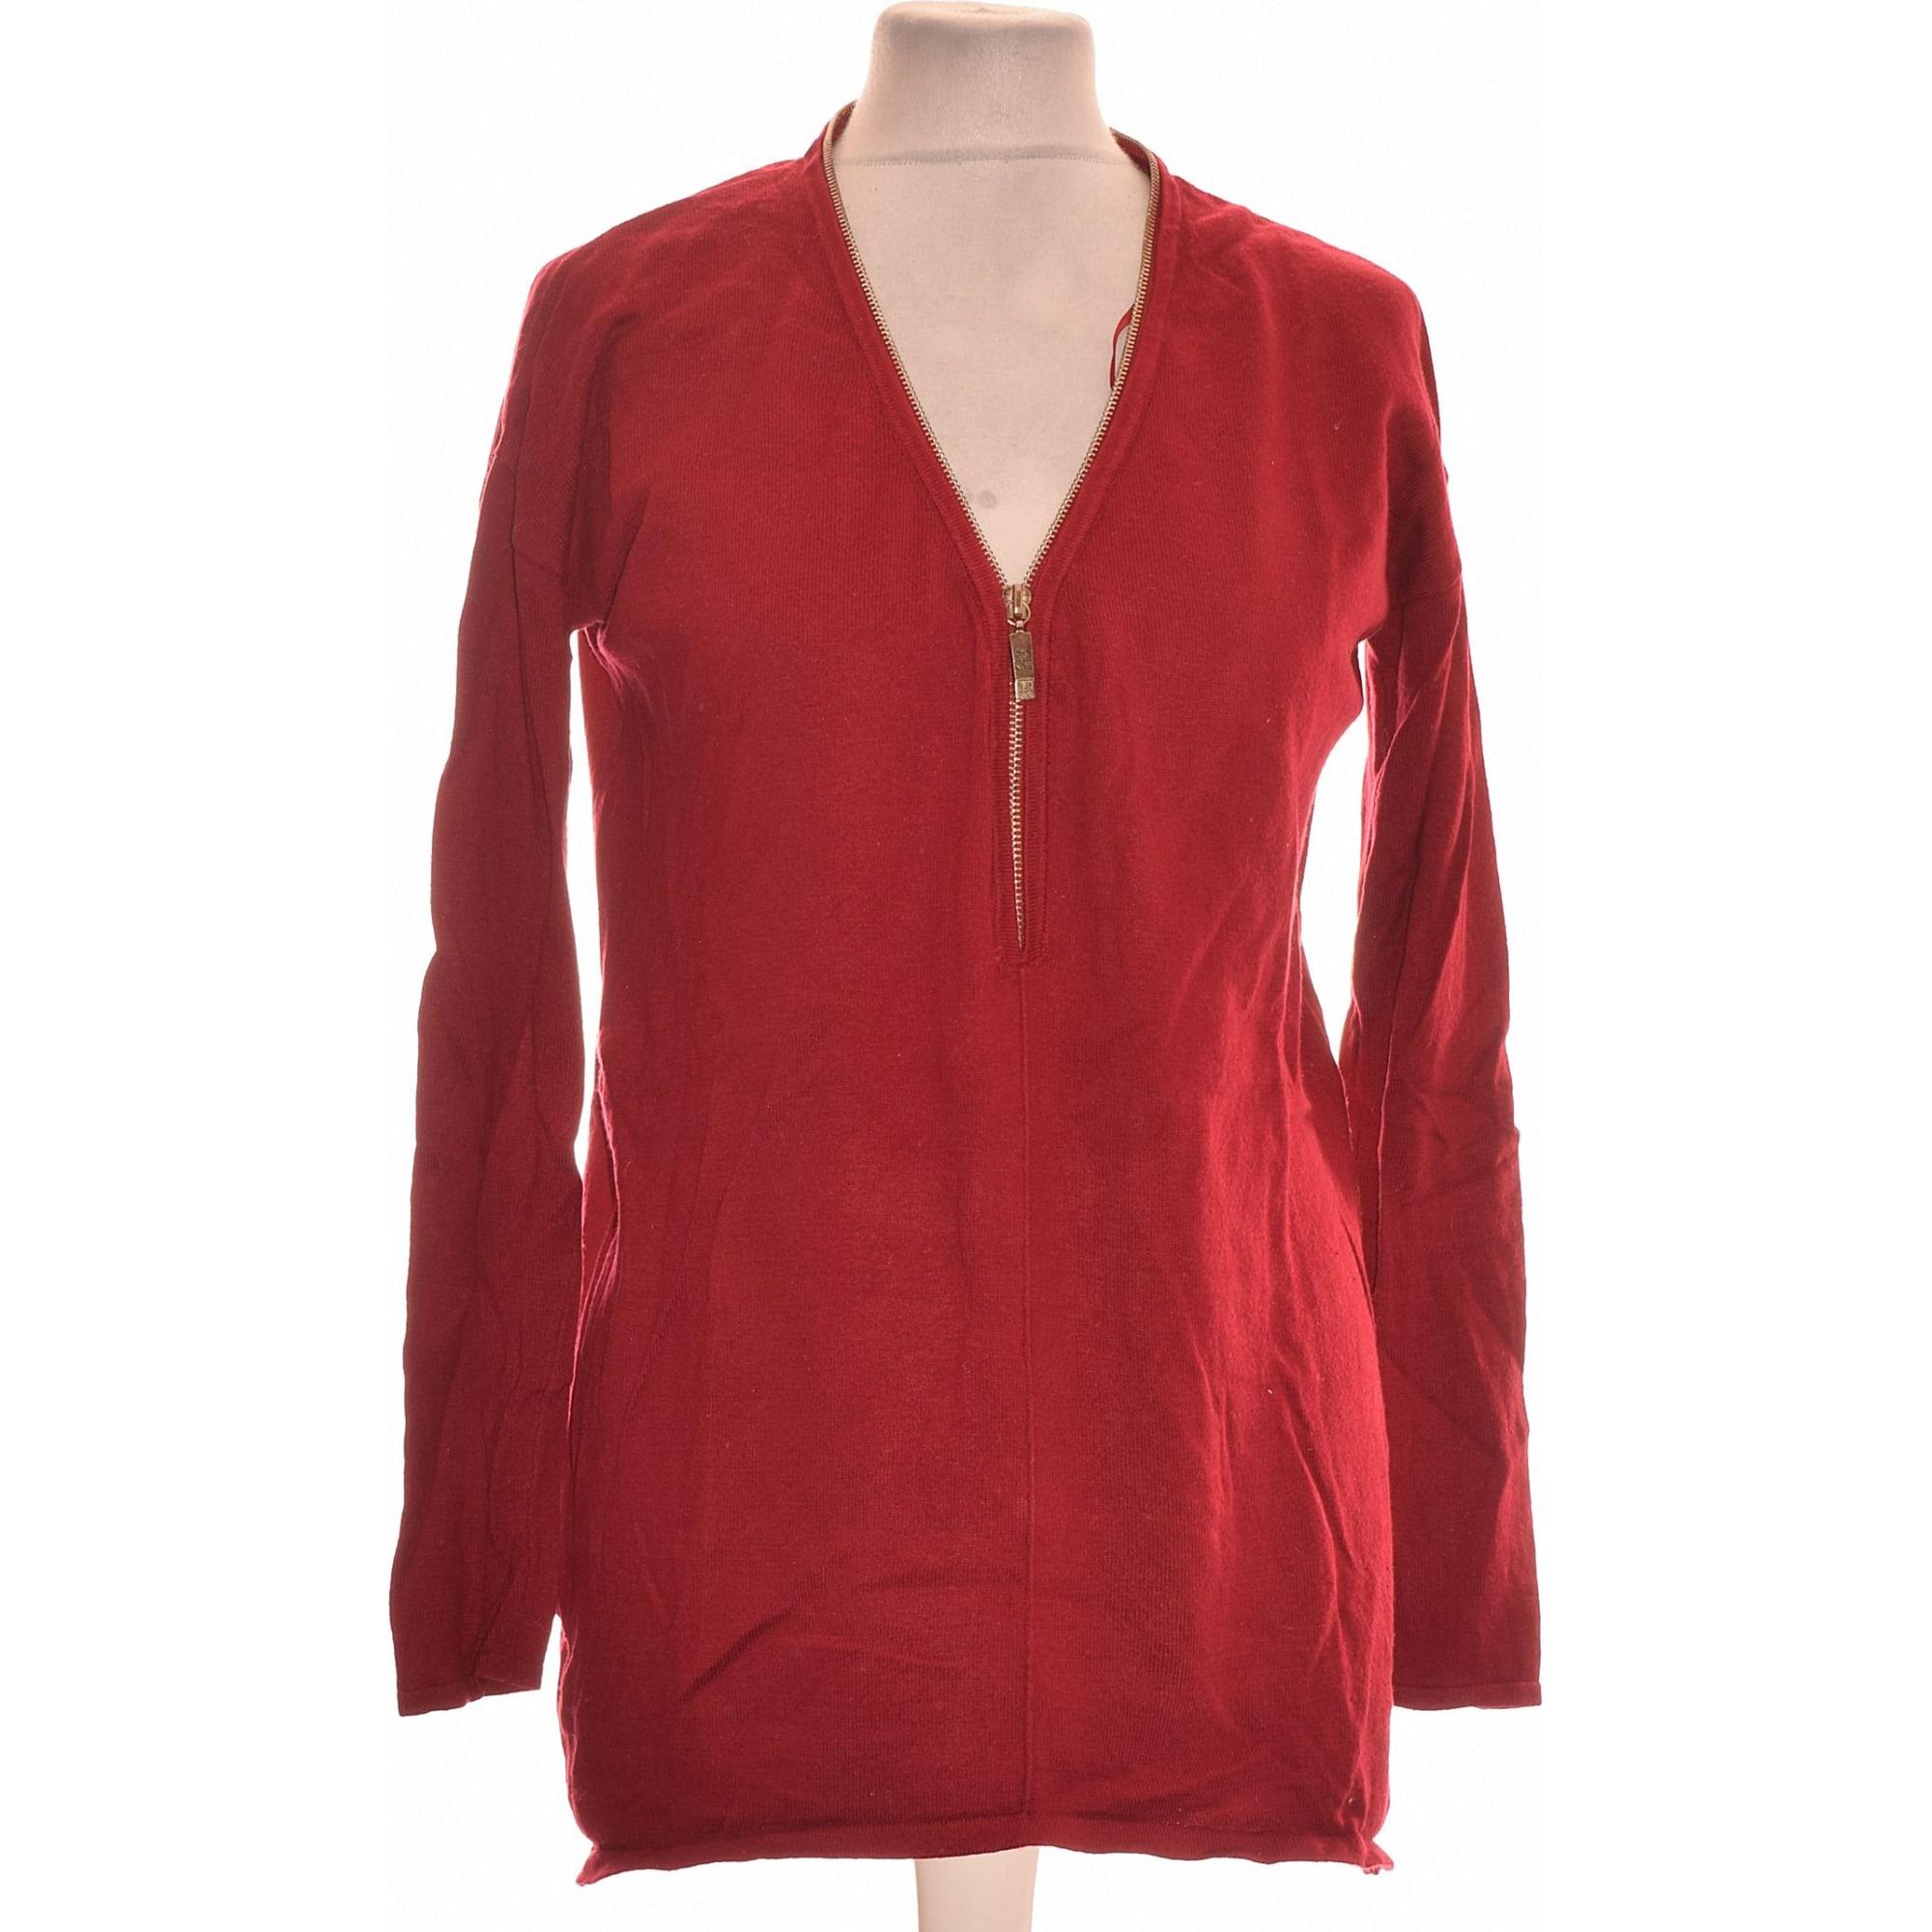 Top, tee-shirt GRAIN DE MALICE Rouge, bordeaux